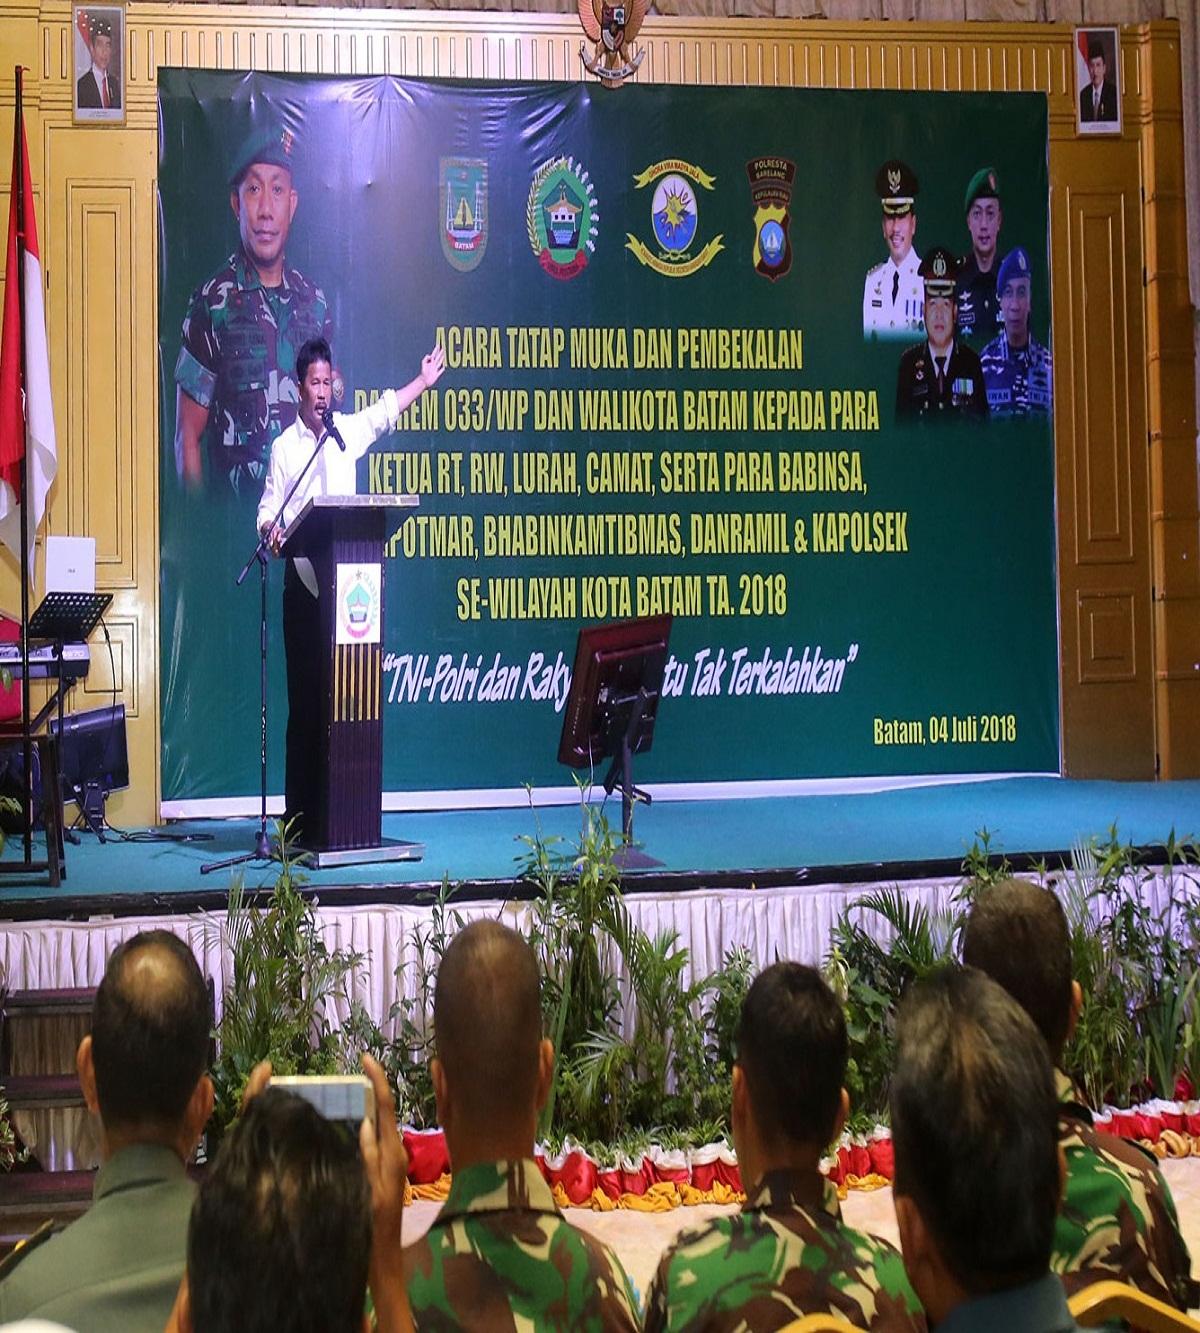 Walikota Batam H Muhammad Rudi memberikan sambutan pada Acara Pembekalan bagi RT RW, Babinsa dan Babinkamtibmas se Kota Batam.